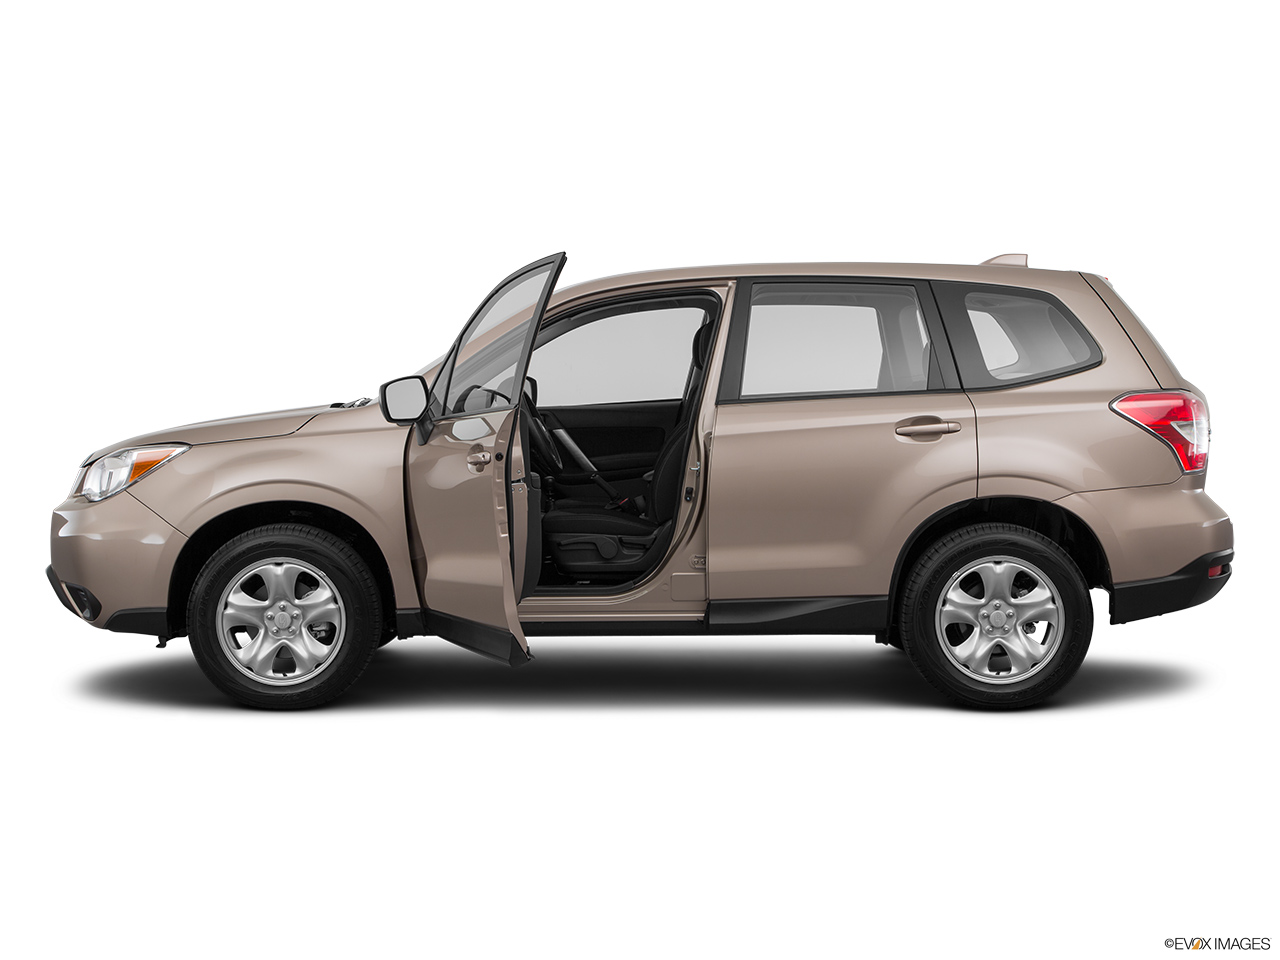 subaru forester 2016 2 5 premium in bahrain new car. Black Bedroom Furniture Sets. Home Design Ideas